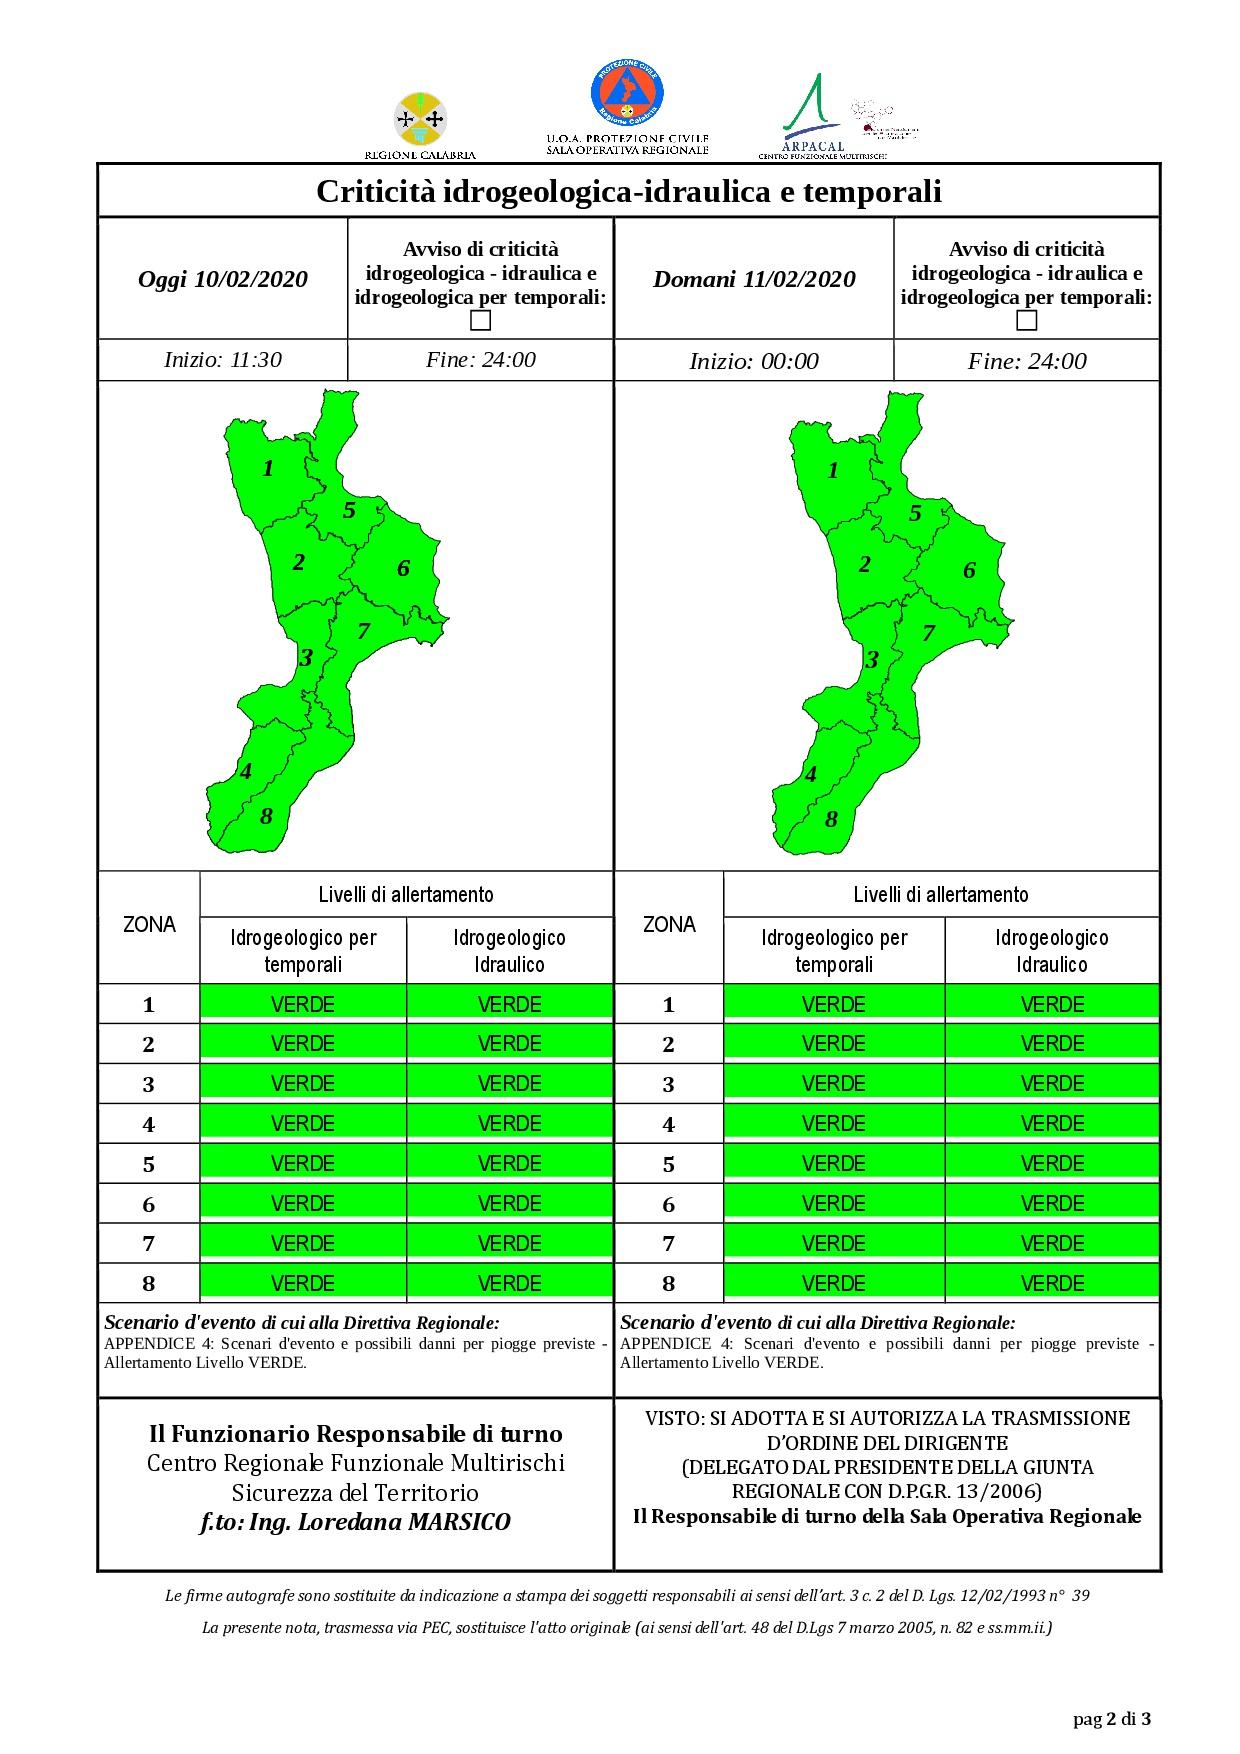 Criticità idrogeologica-idraulica e temporali in Calabria 10-02-2020